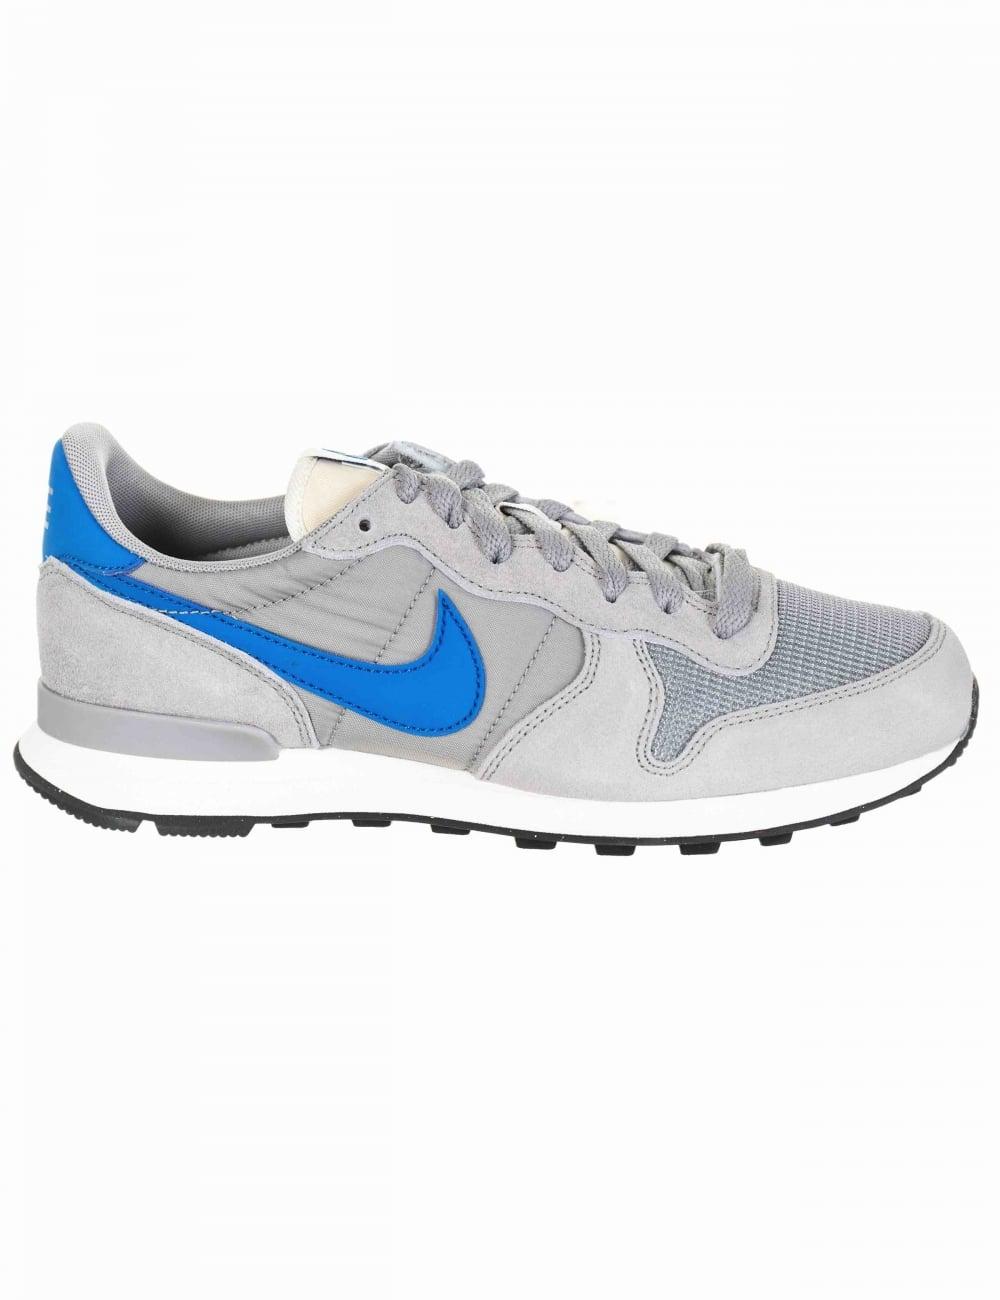 Nike Internationalist Trainers - Matte